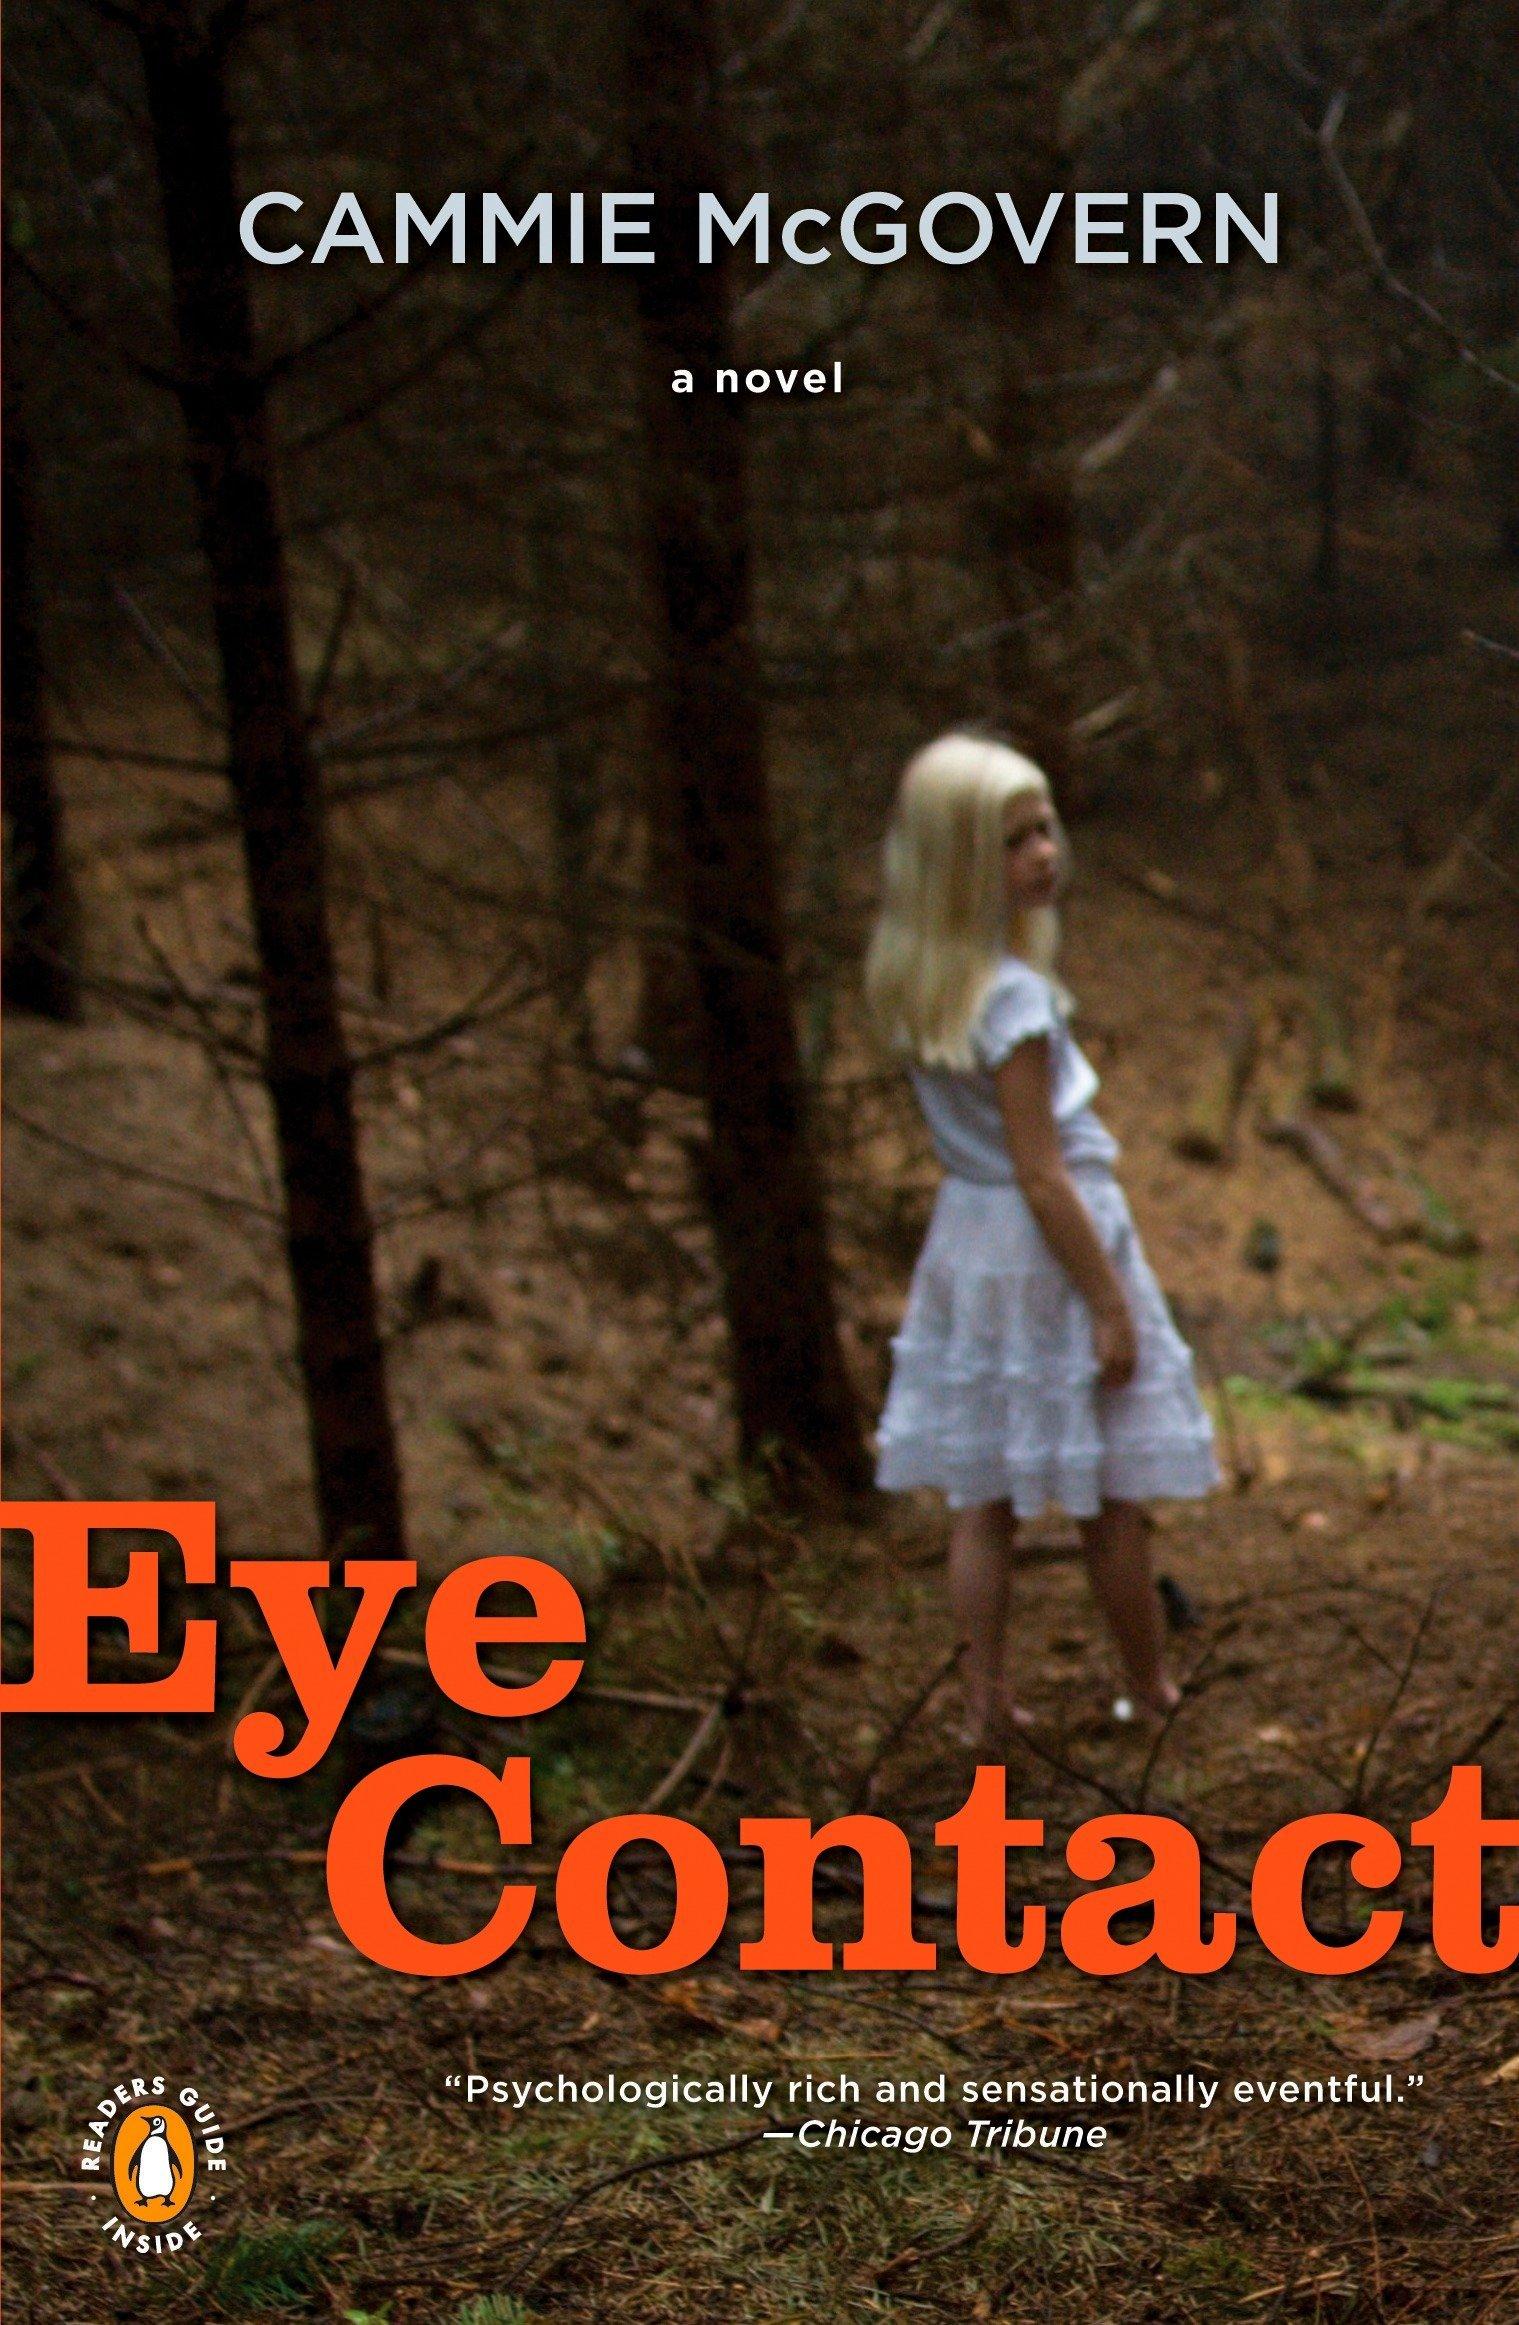 Home grown amateurs eye contact